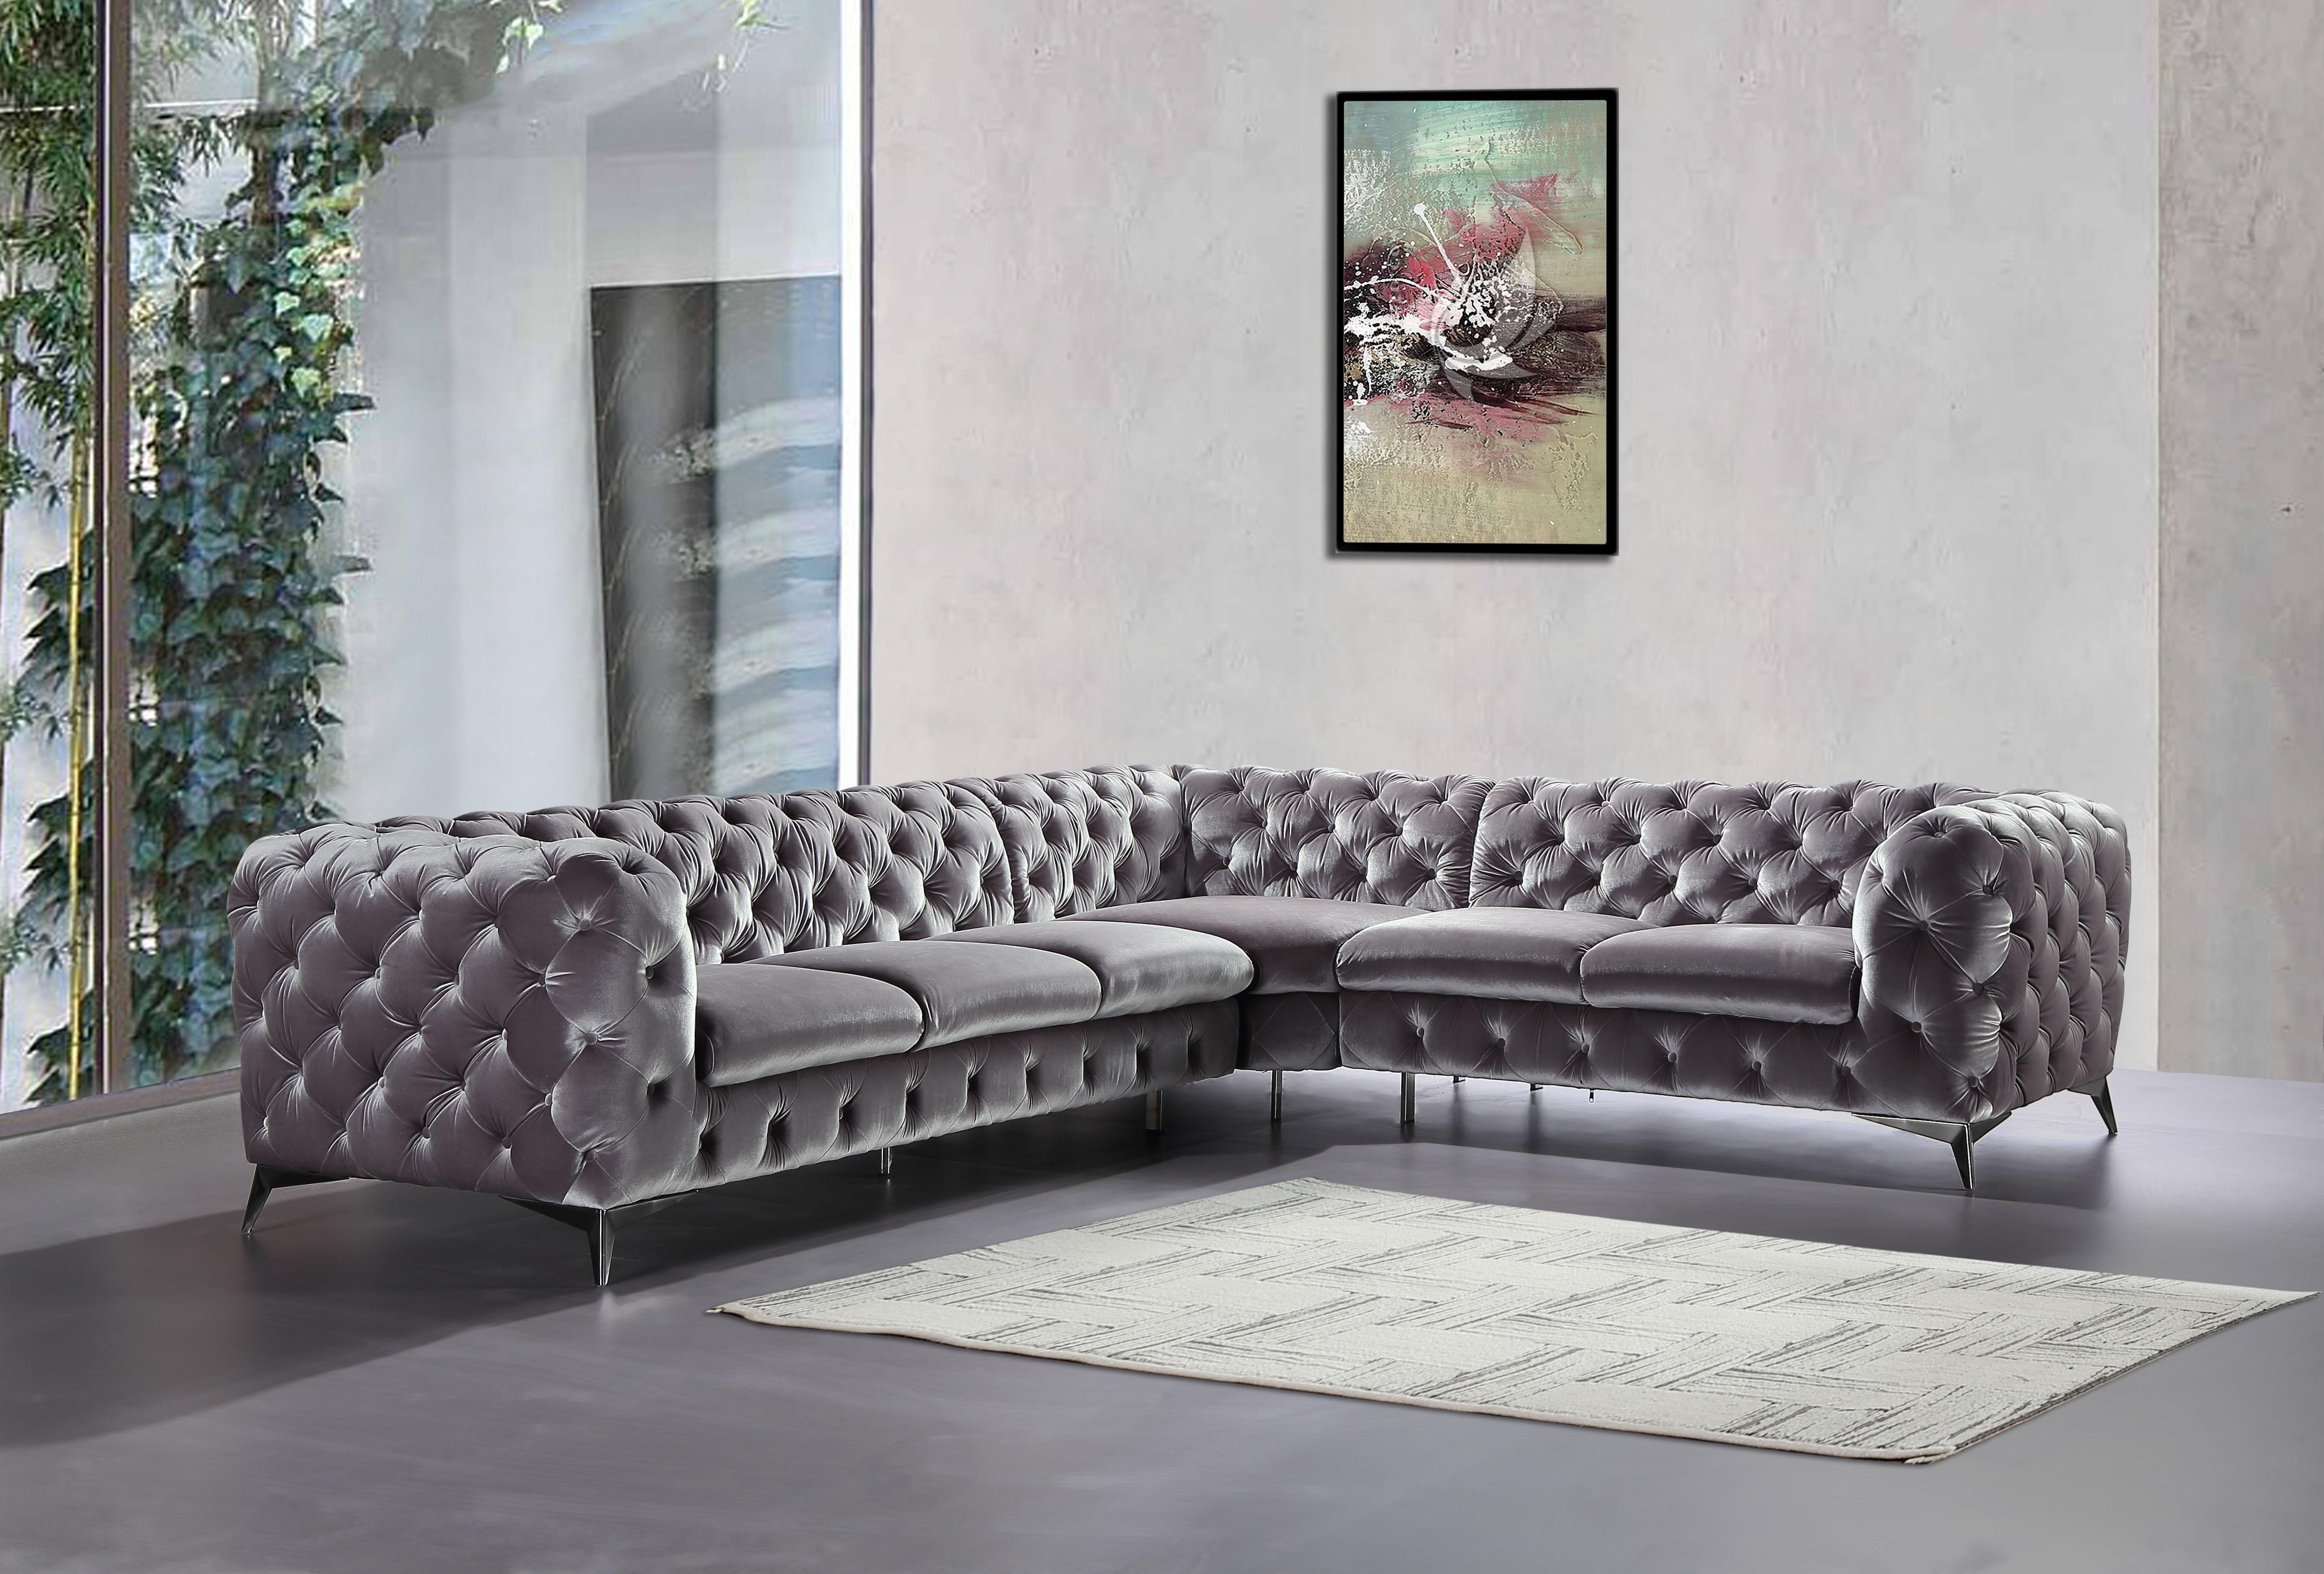 Modern Living Room Sofa Set Fabric, Living Room L Shaped Sofa